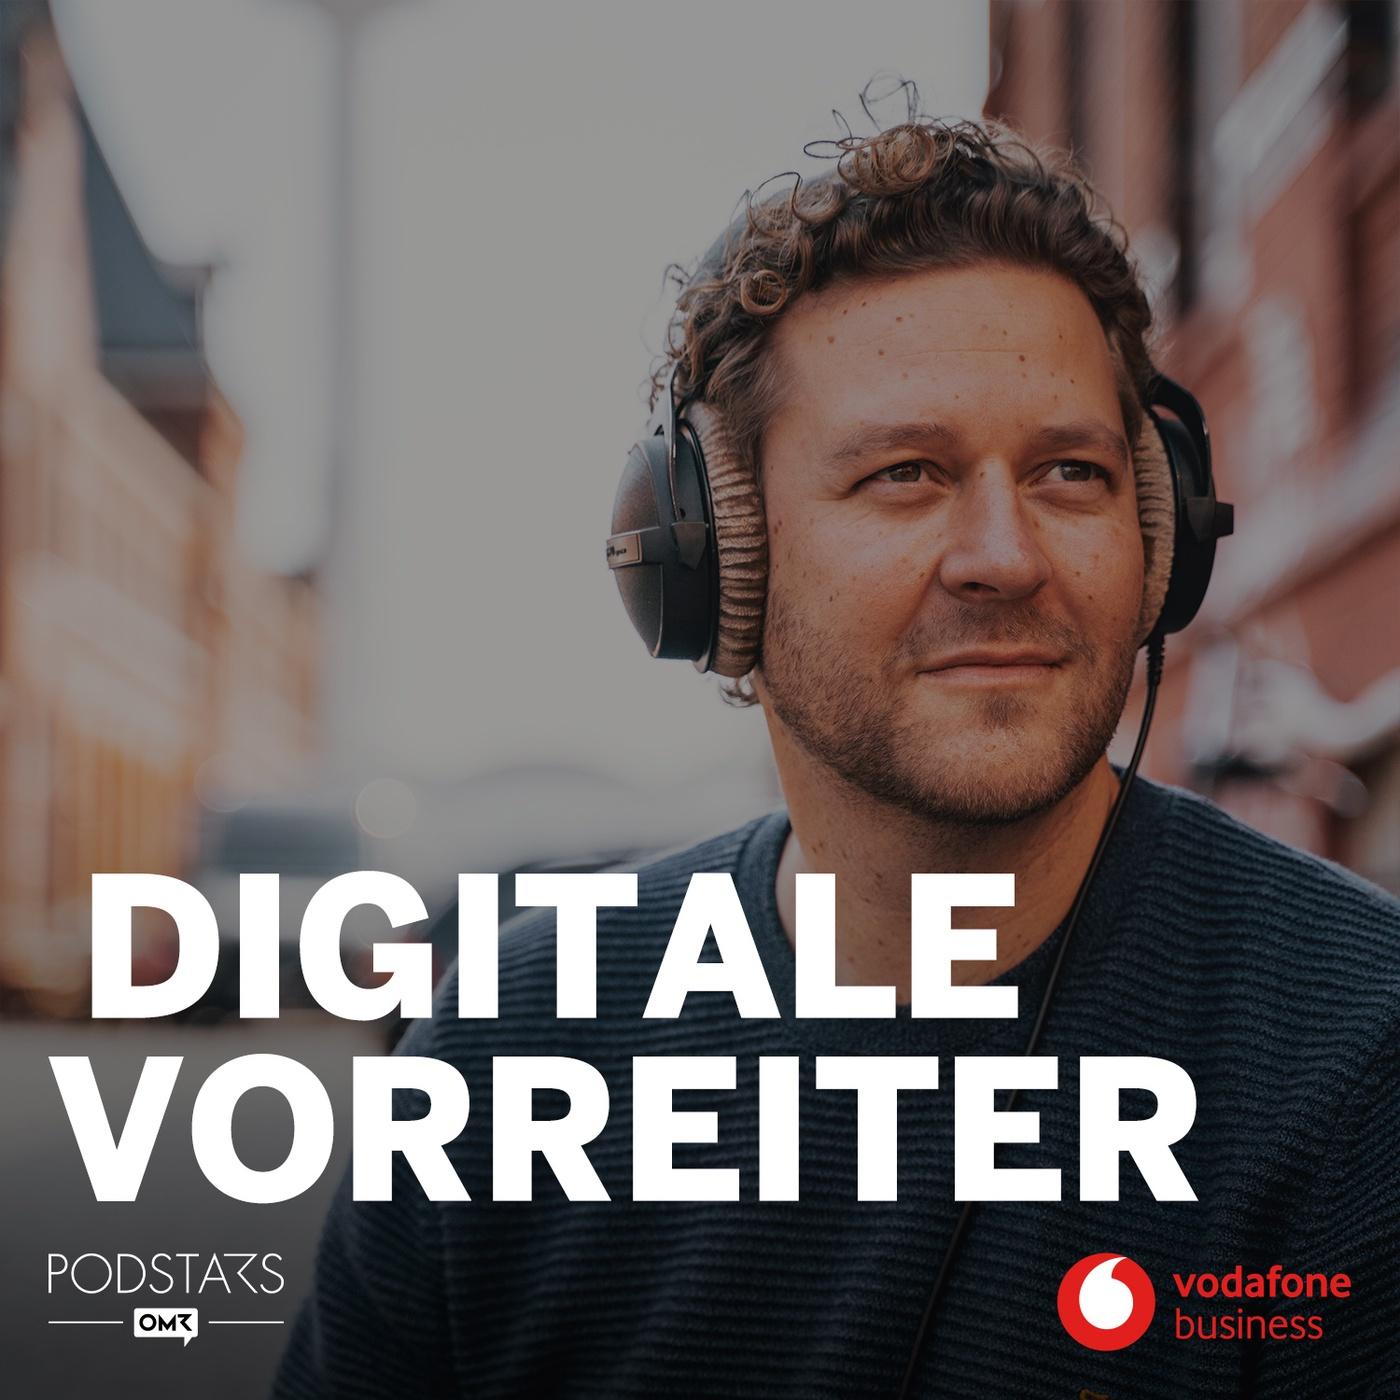 Digitale Vorreiter - Vodafone Business Cases